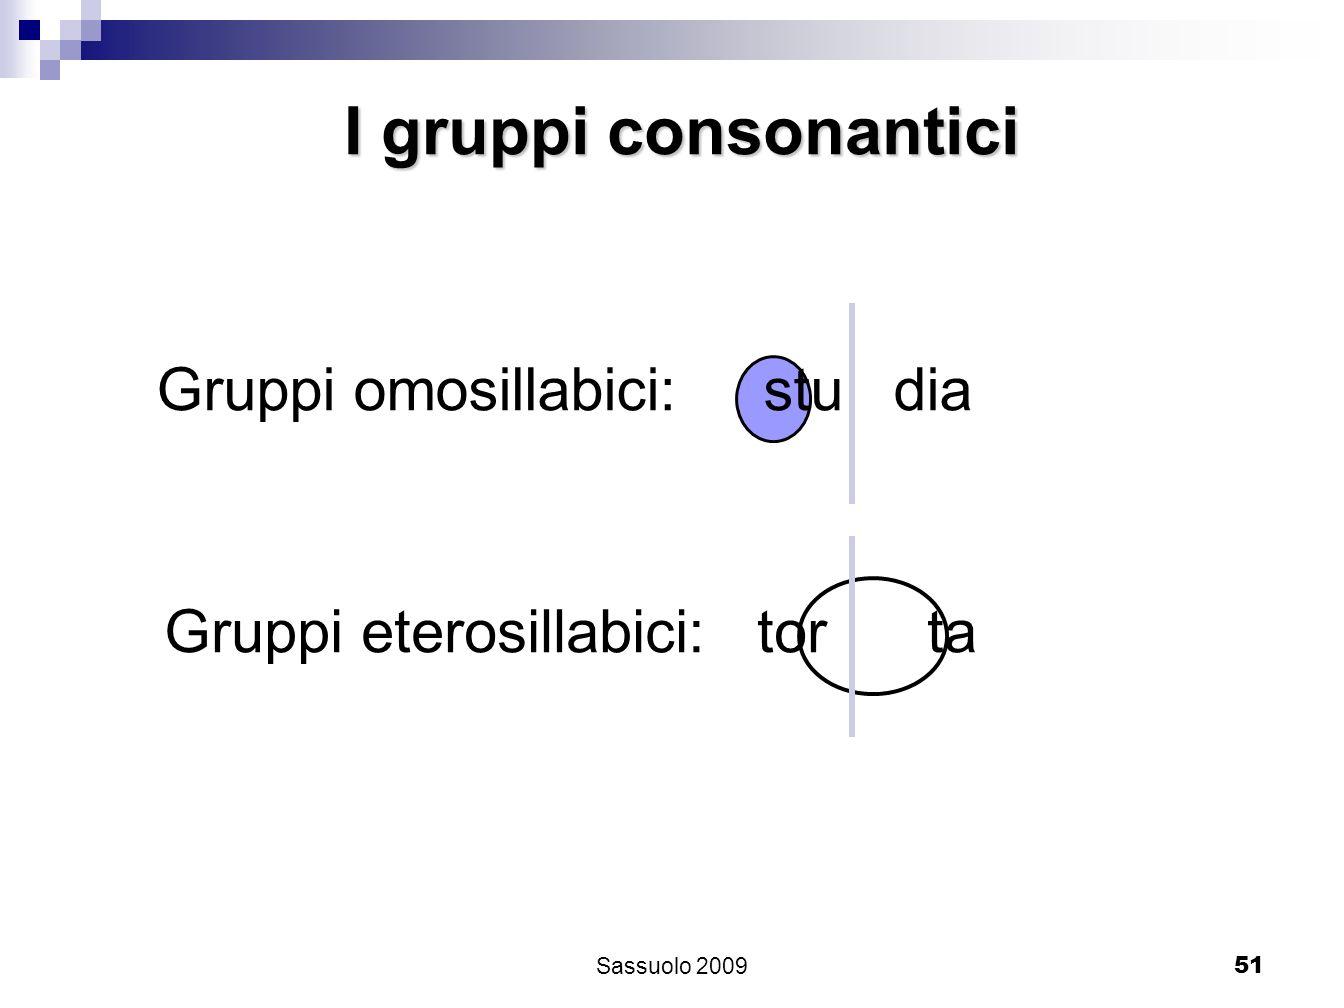 51 I gruppi consonantici Gruppi omosillabici: stu dia Gruppi eterosillabici: tor ta Sassuolo 2009